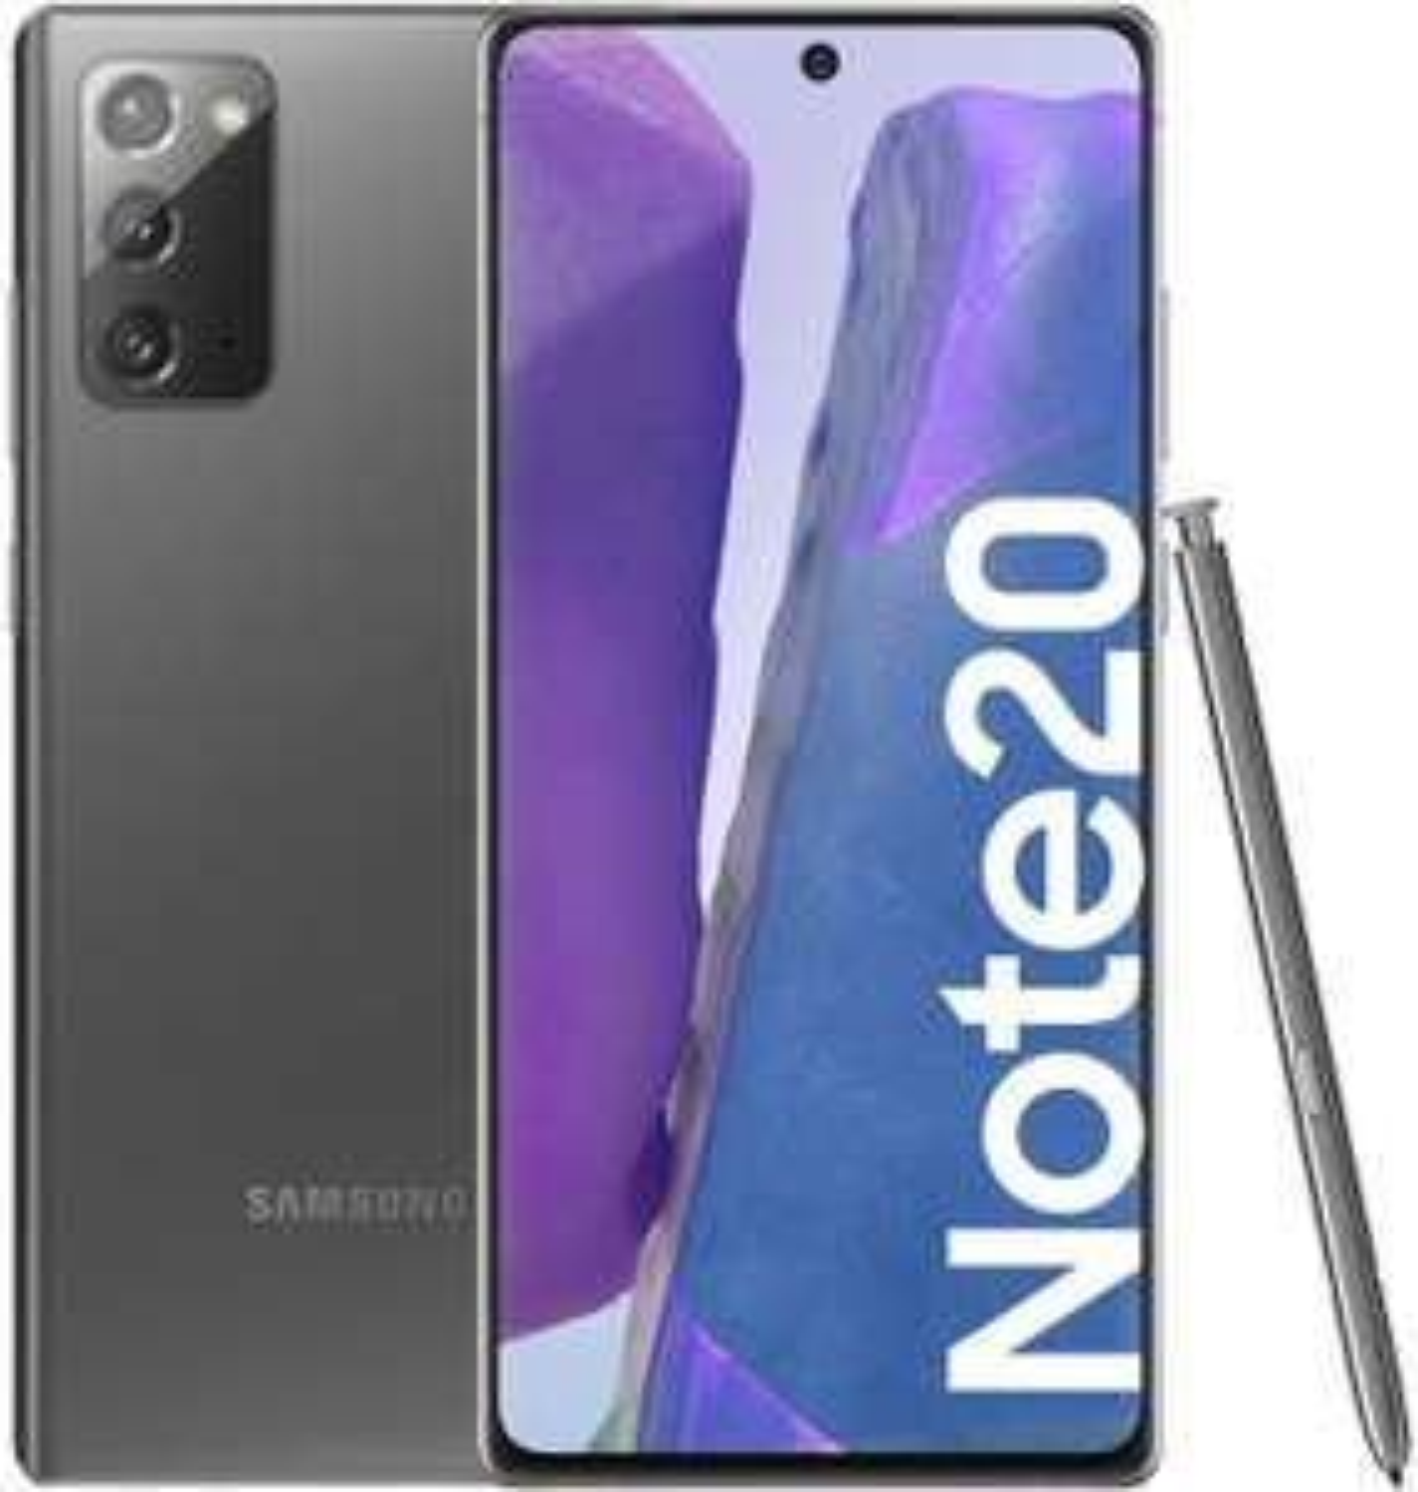 Samsung Galaxy Note 20 4G Smartphone - £526.05 (UK Mainland) @ Amazon Spain